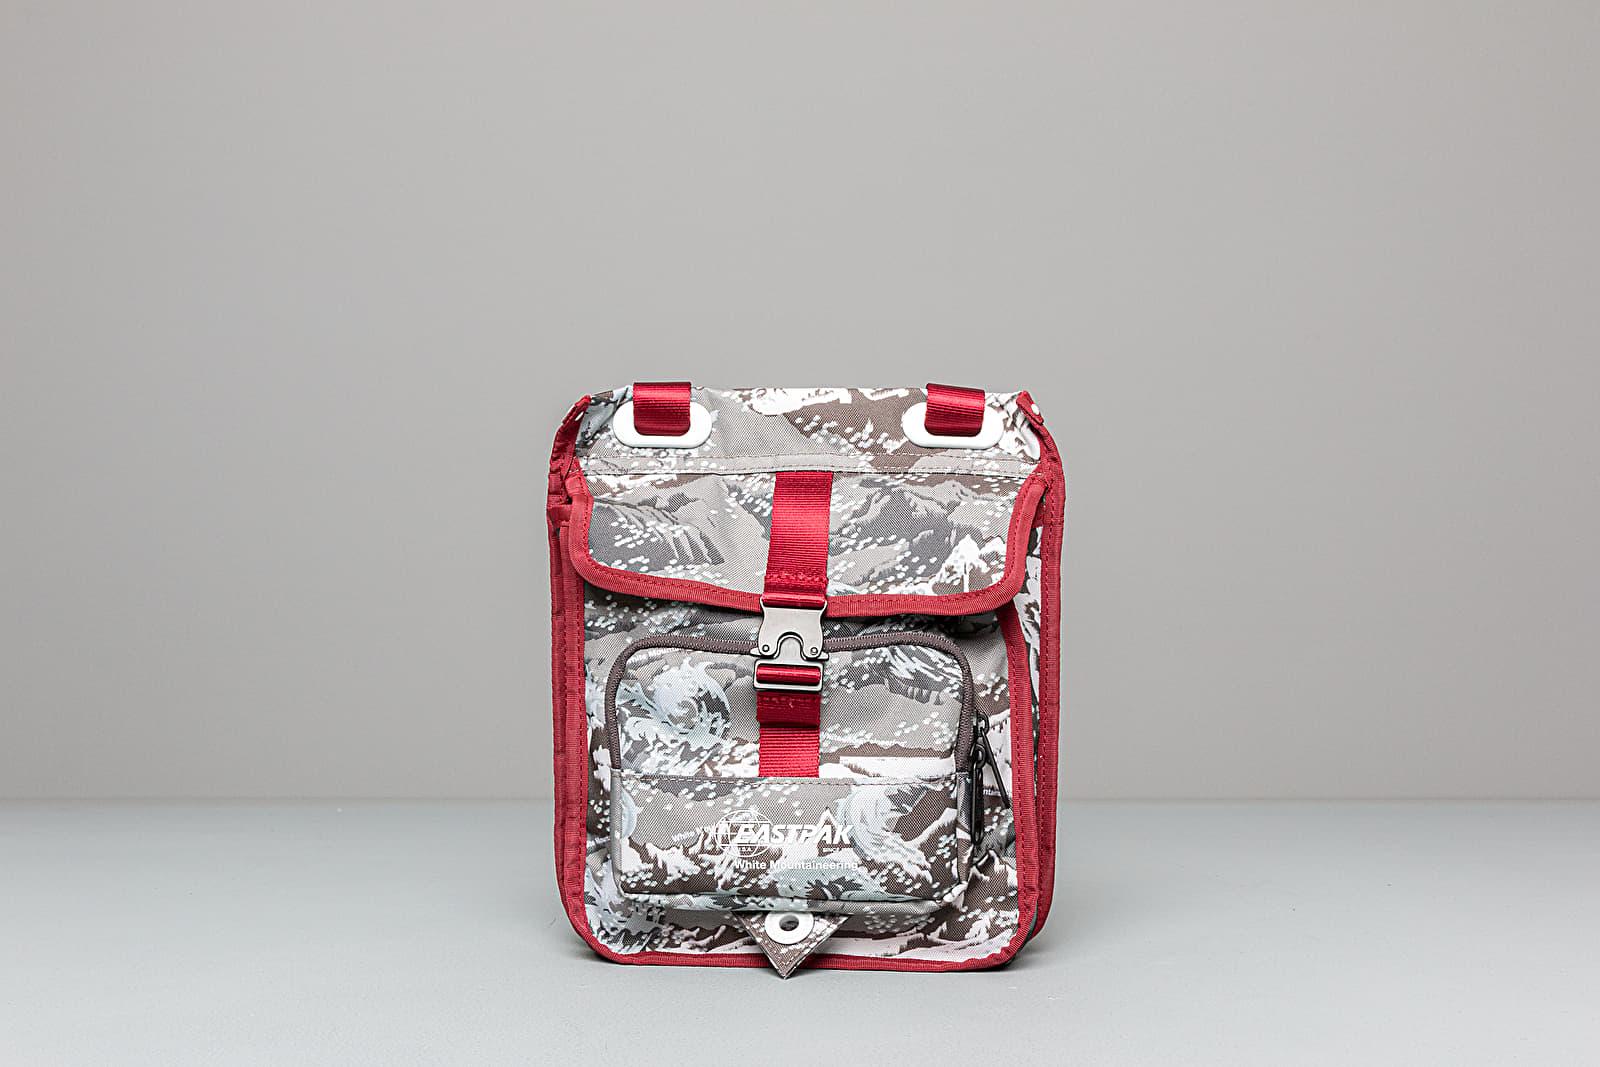 Eastpak x White Mountaineering Musette Bag